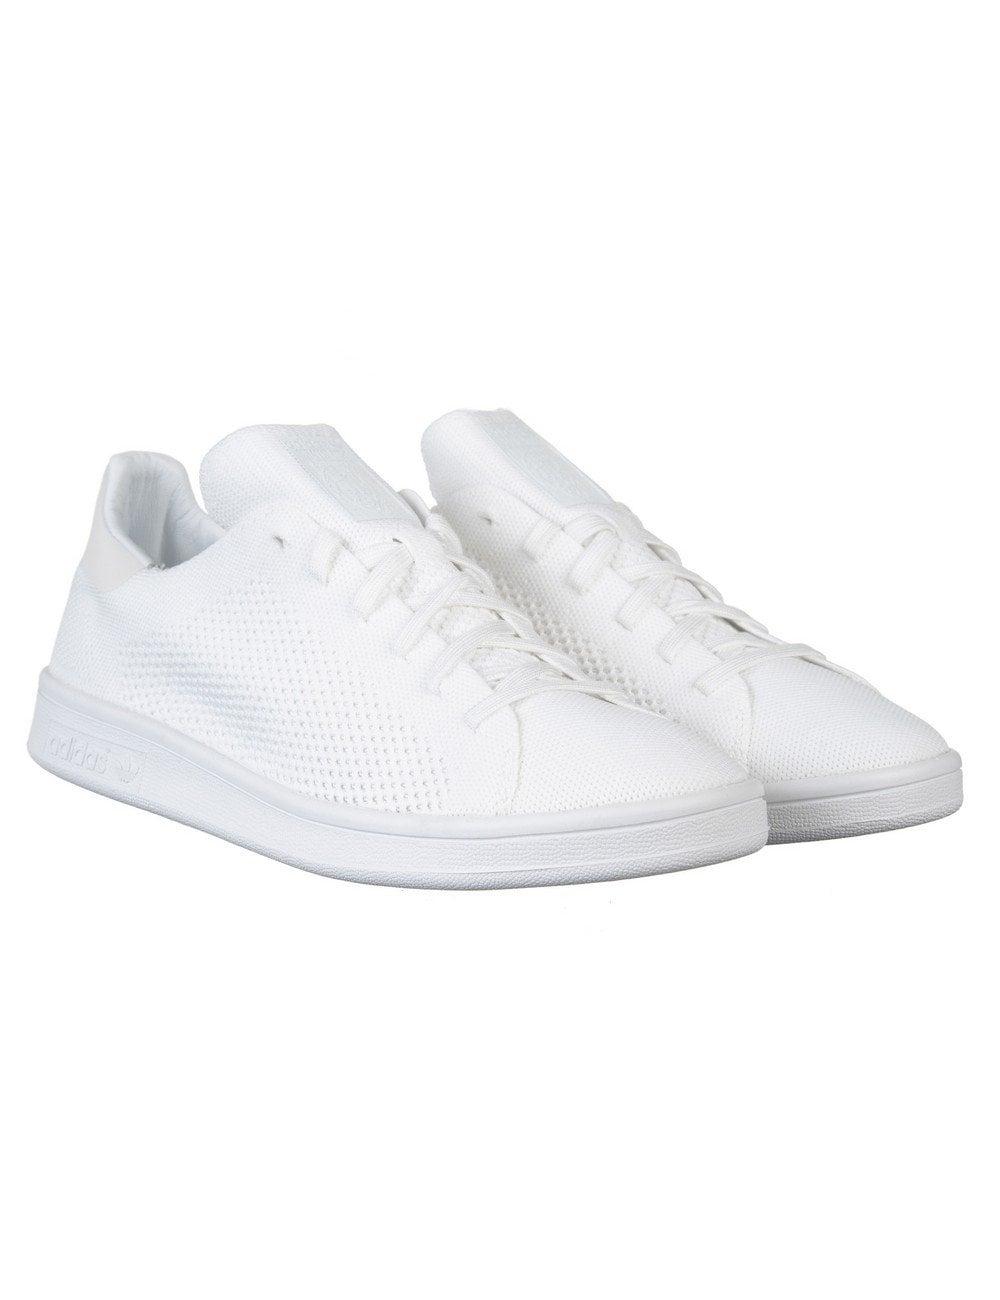 separation shoes c22da ed12e Stan Smith Primeknit Shoes - White/White